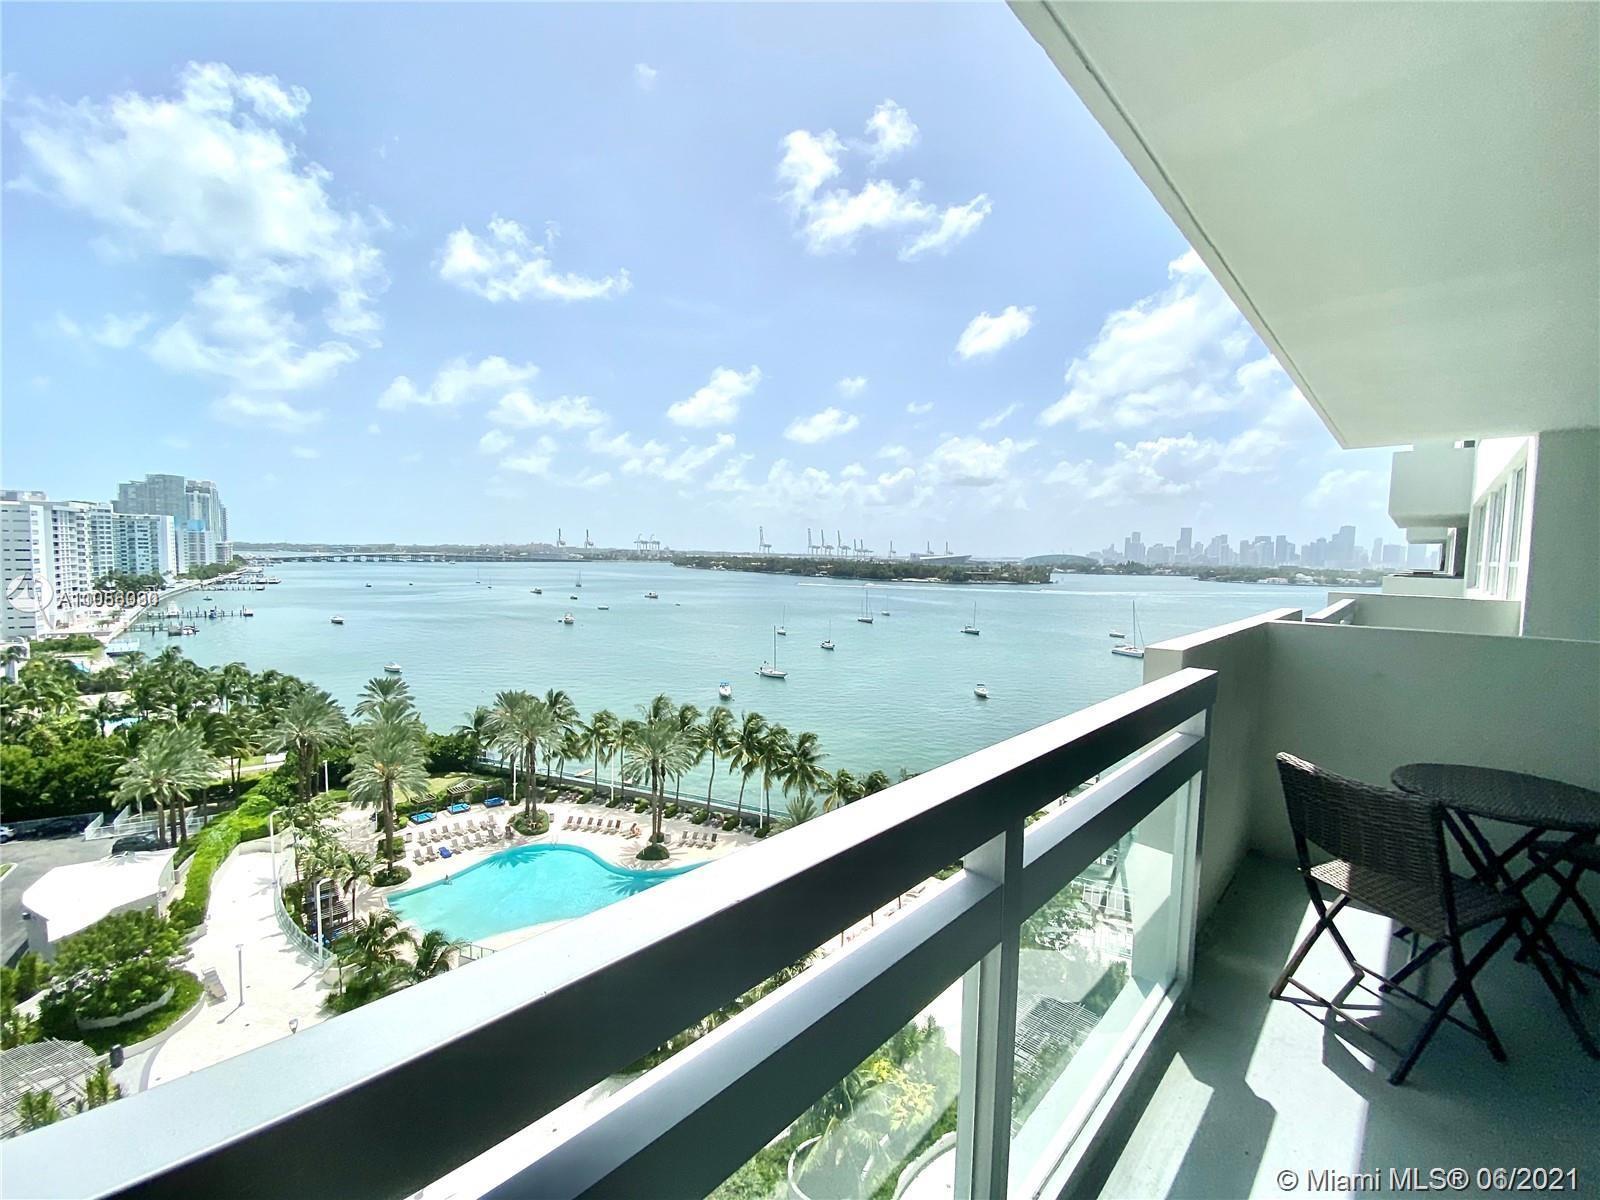 Flamingo South Beach #1226 - 1500 Bay Rd #1226, Miami, FL 33139